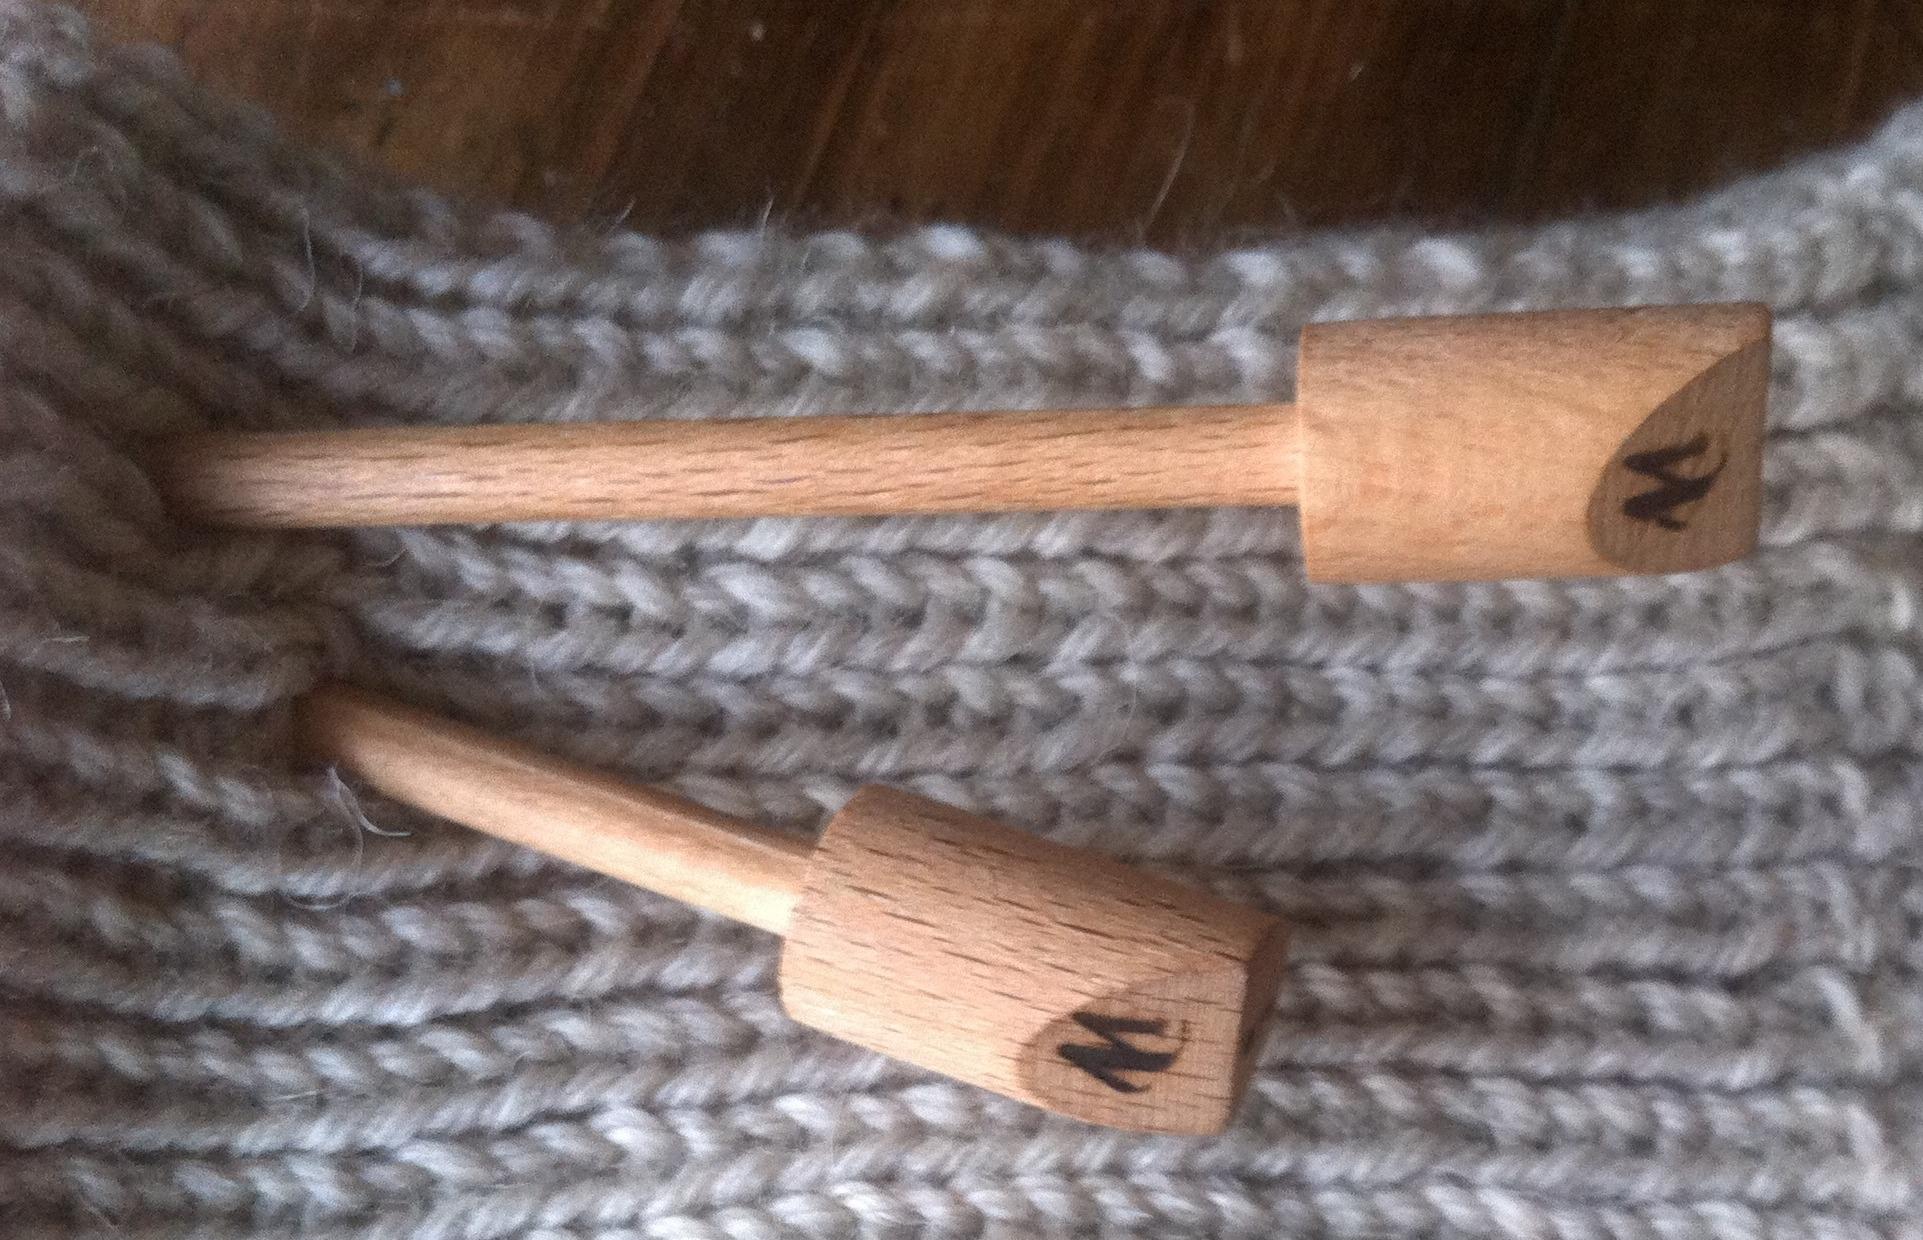 sustainable knitting needles